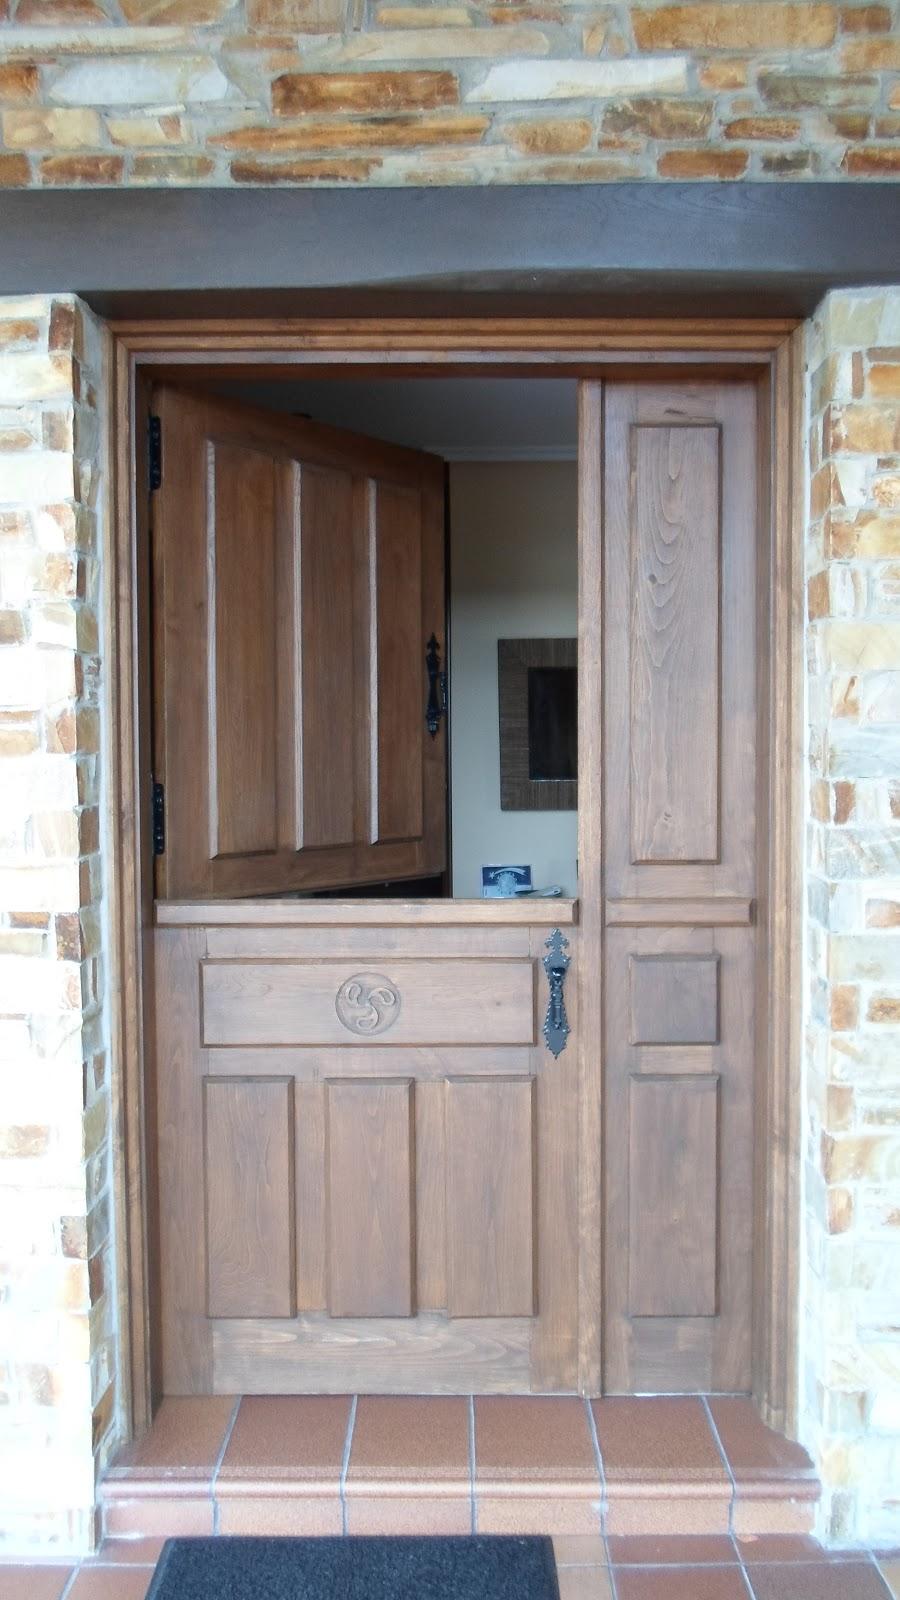 Con madera puertas de entrada for Puerta entrada madera